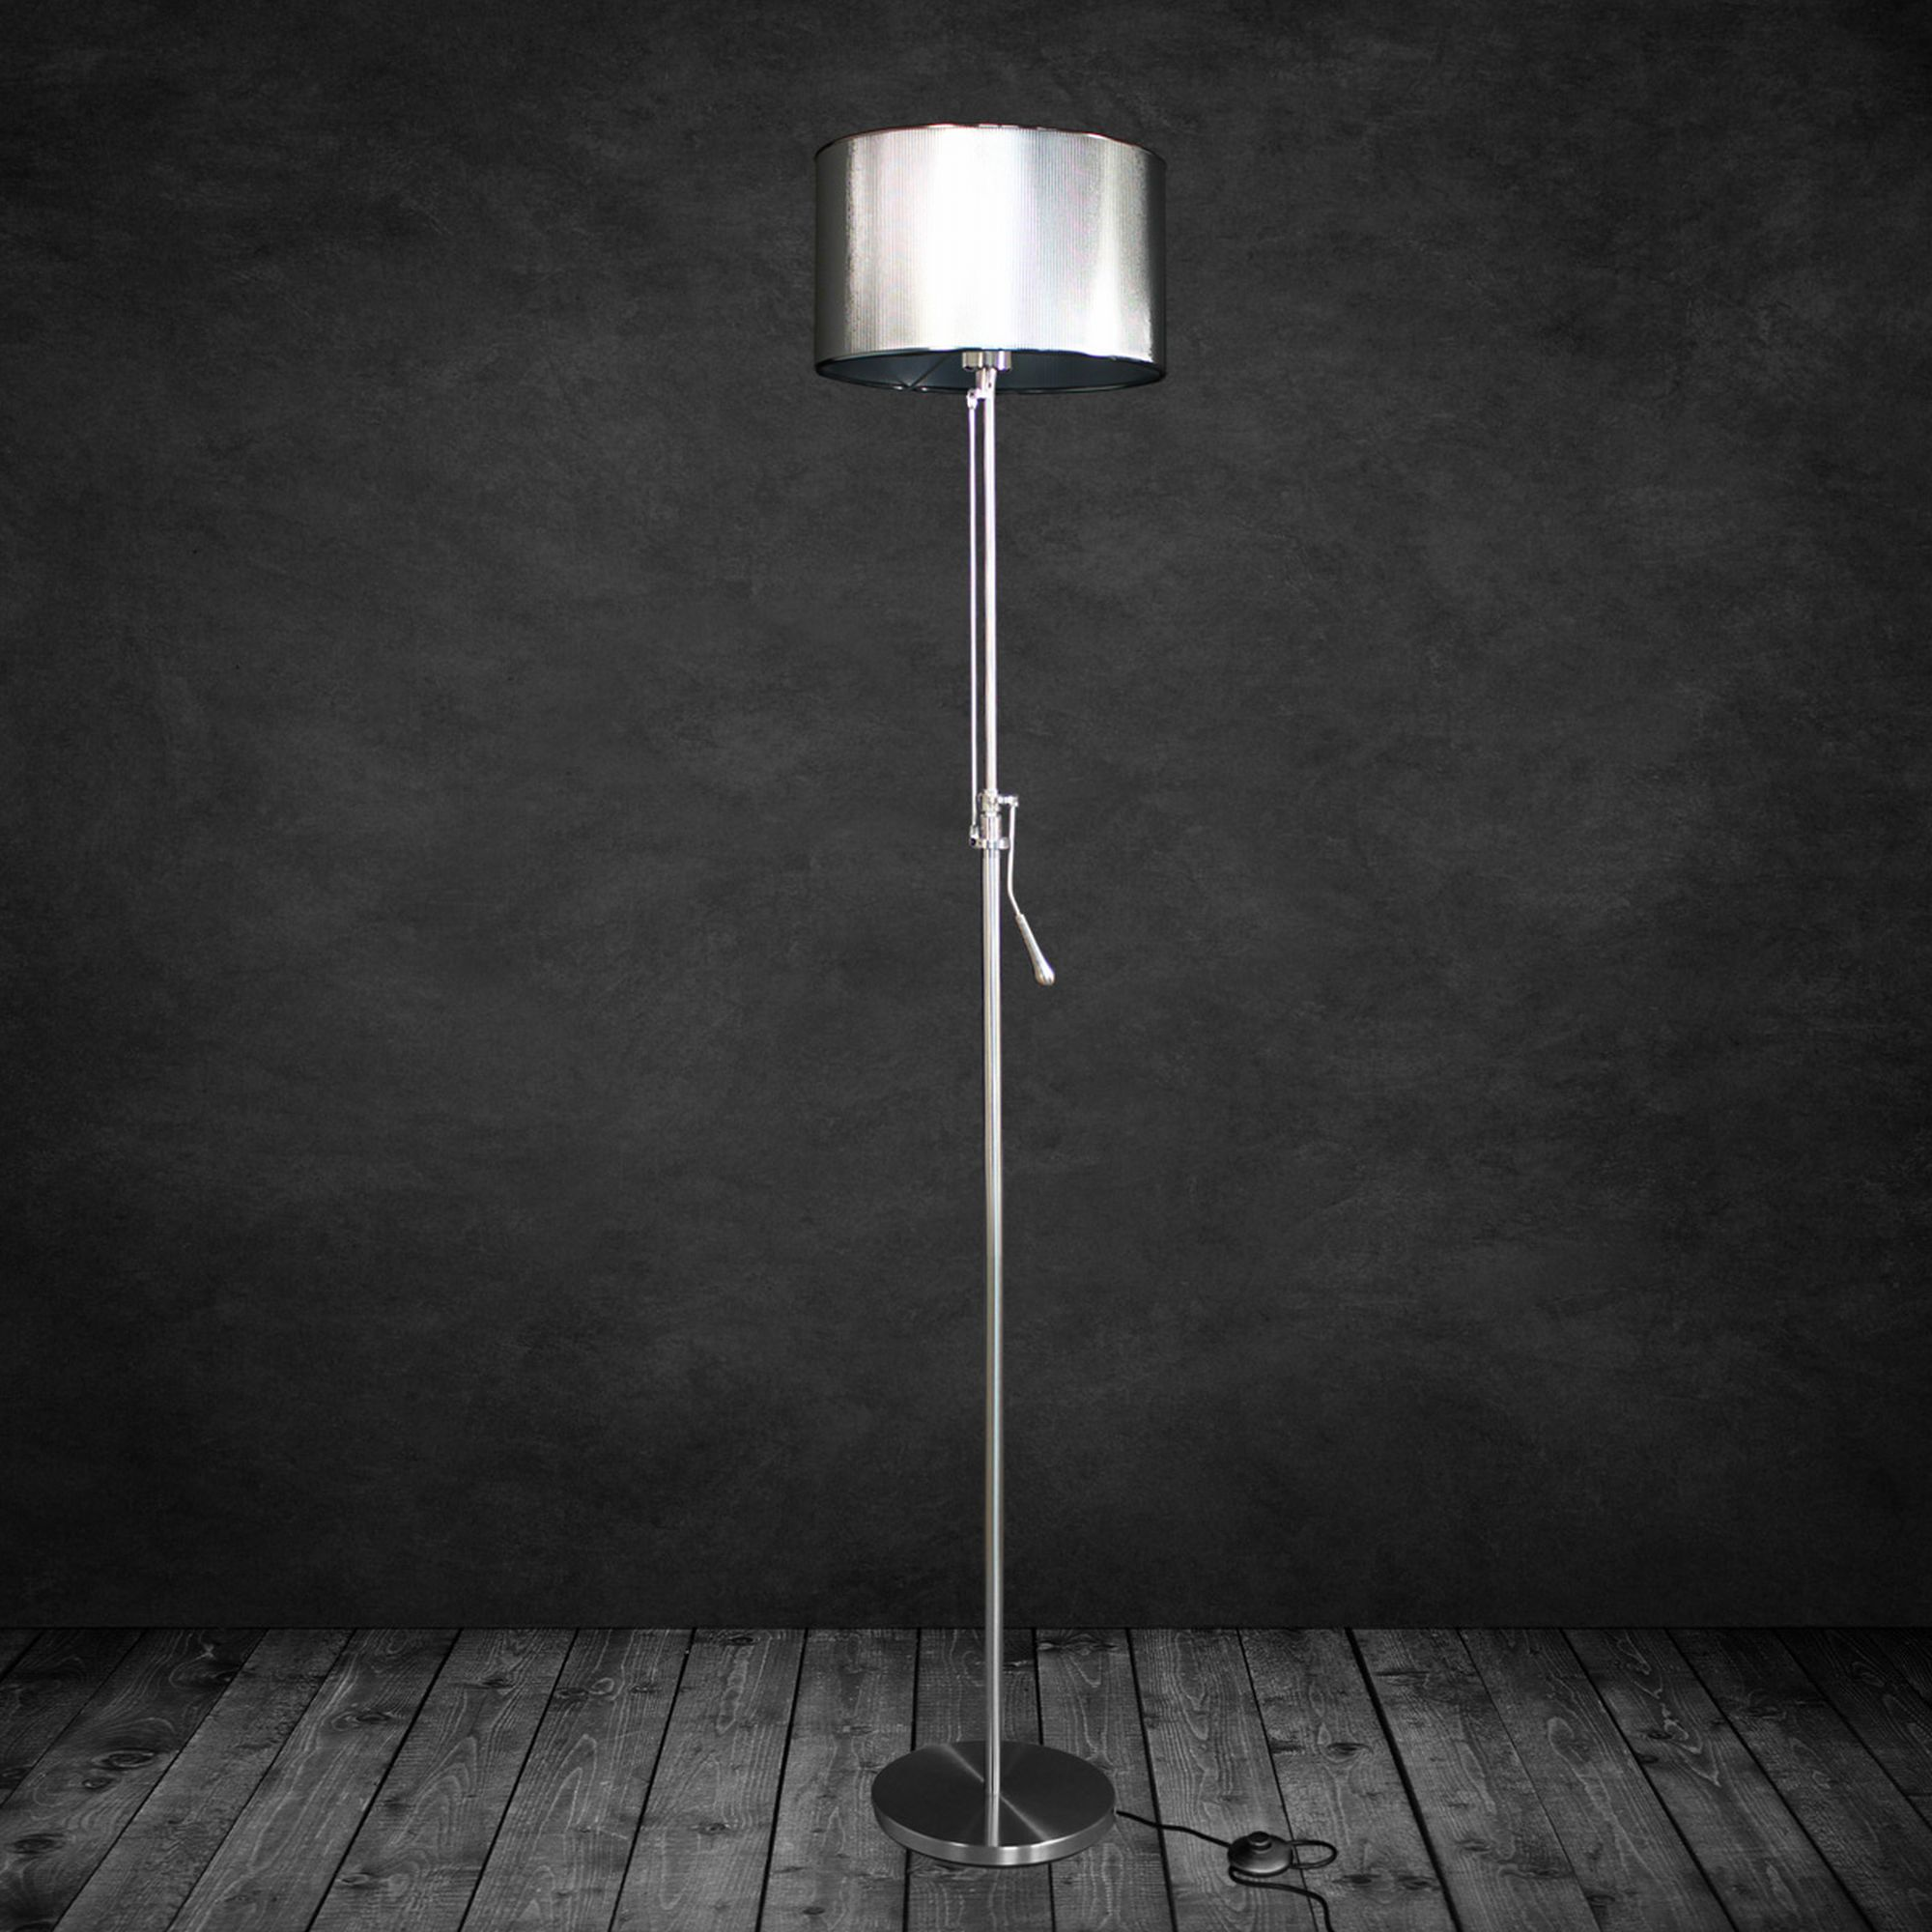 Full Size of Wohnzimmer Beleuchtung Luneues Weltdesign 2018 Lampe Deckenlampen Modern Modulküche Ikea Sessel Relaxliege Indirekte Miniküche Tisch Sideboard Großes Bild Wohnzimmer Relaxliege Wohnzimmer Ikea